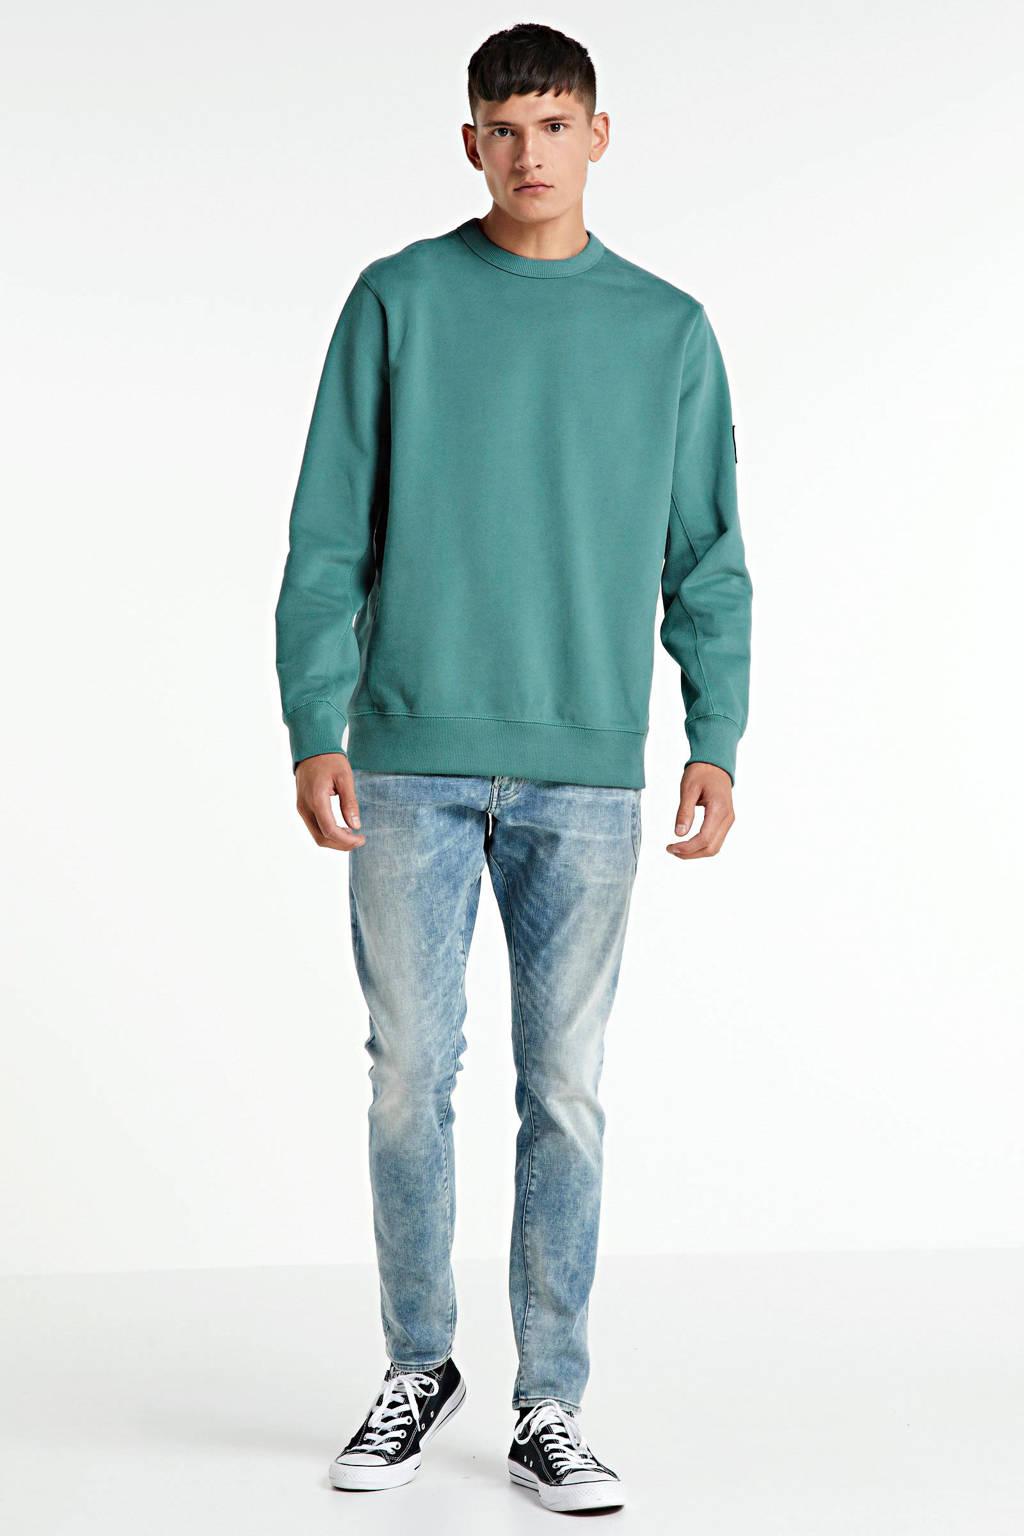 G-Star RAW Lancet skinny jeans sun faded scanda blue, Sun faded scanda blue